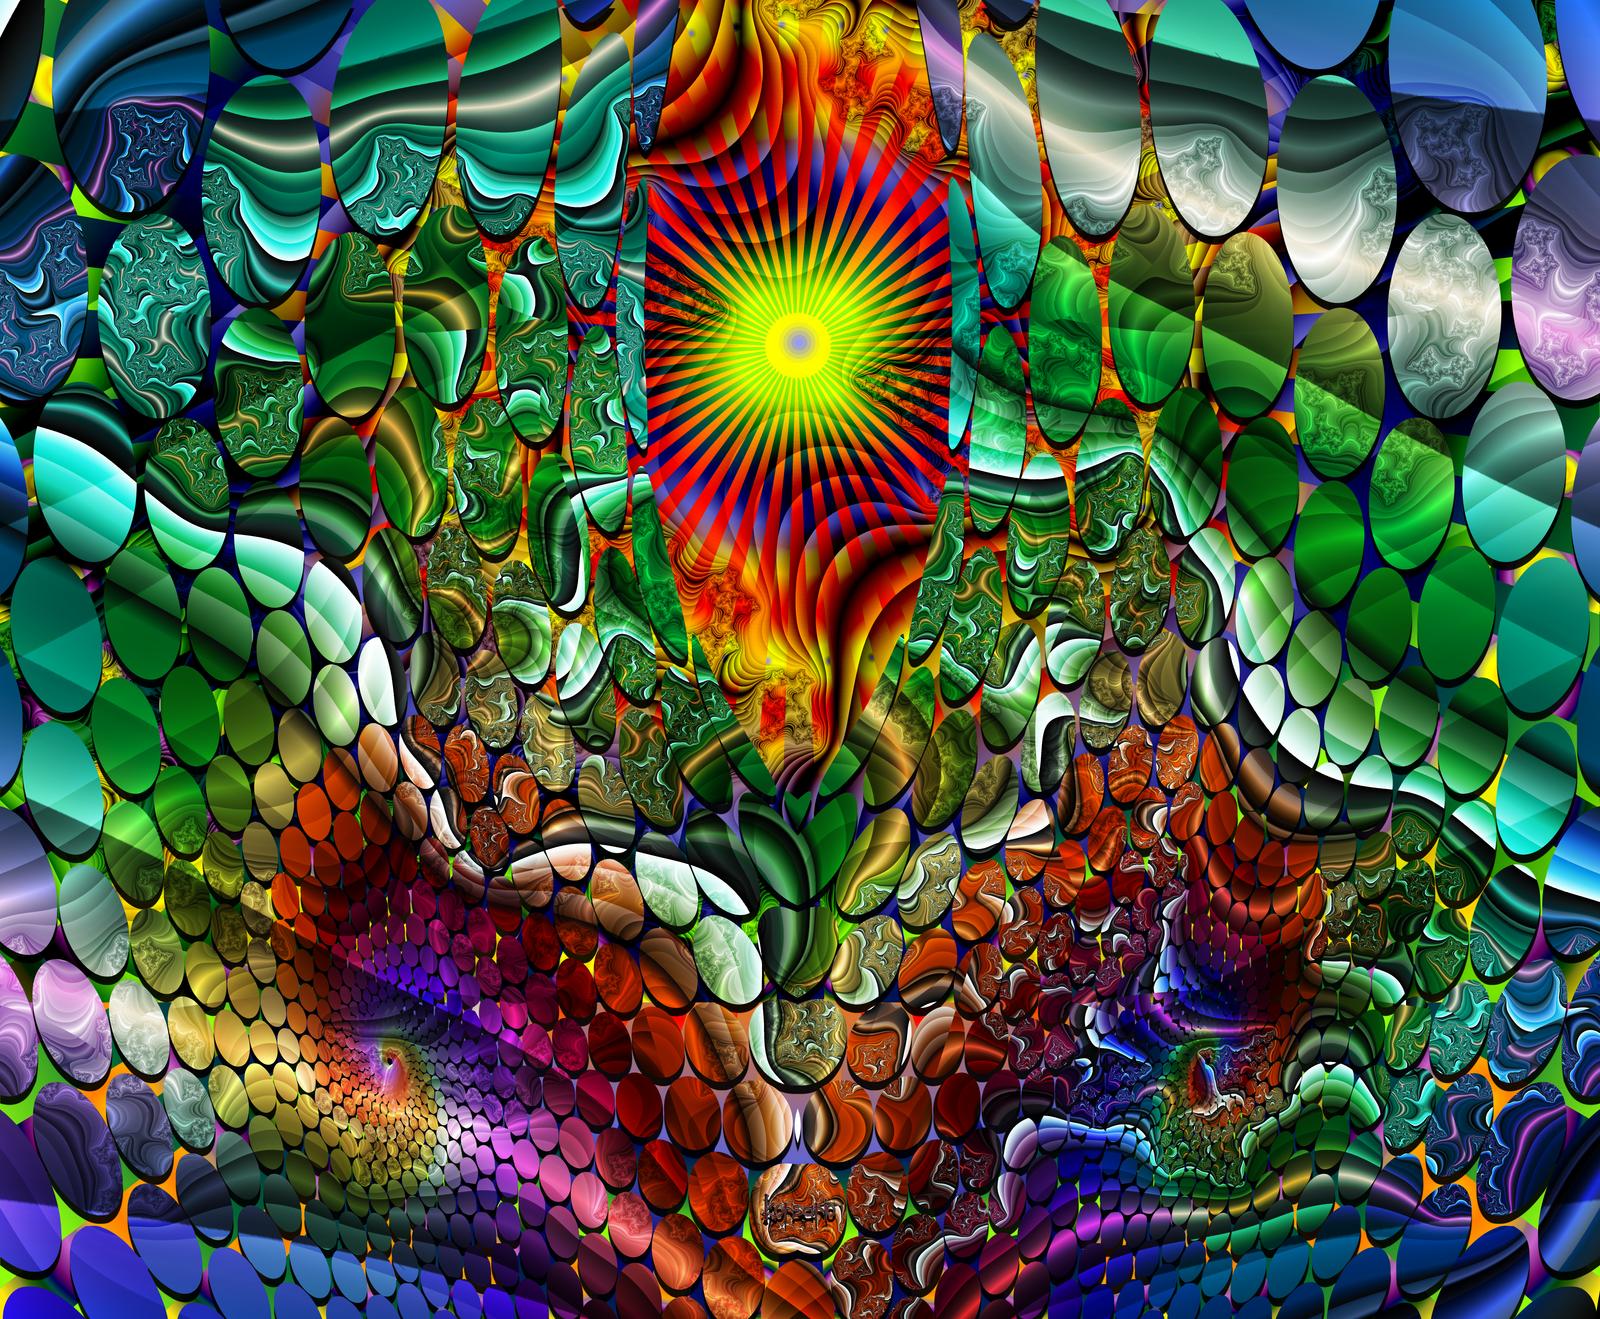 Landscape distorted by ivankorsario